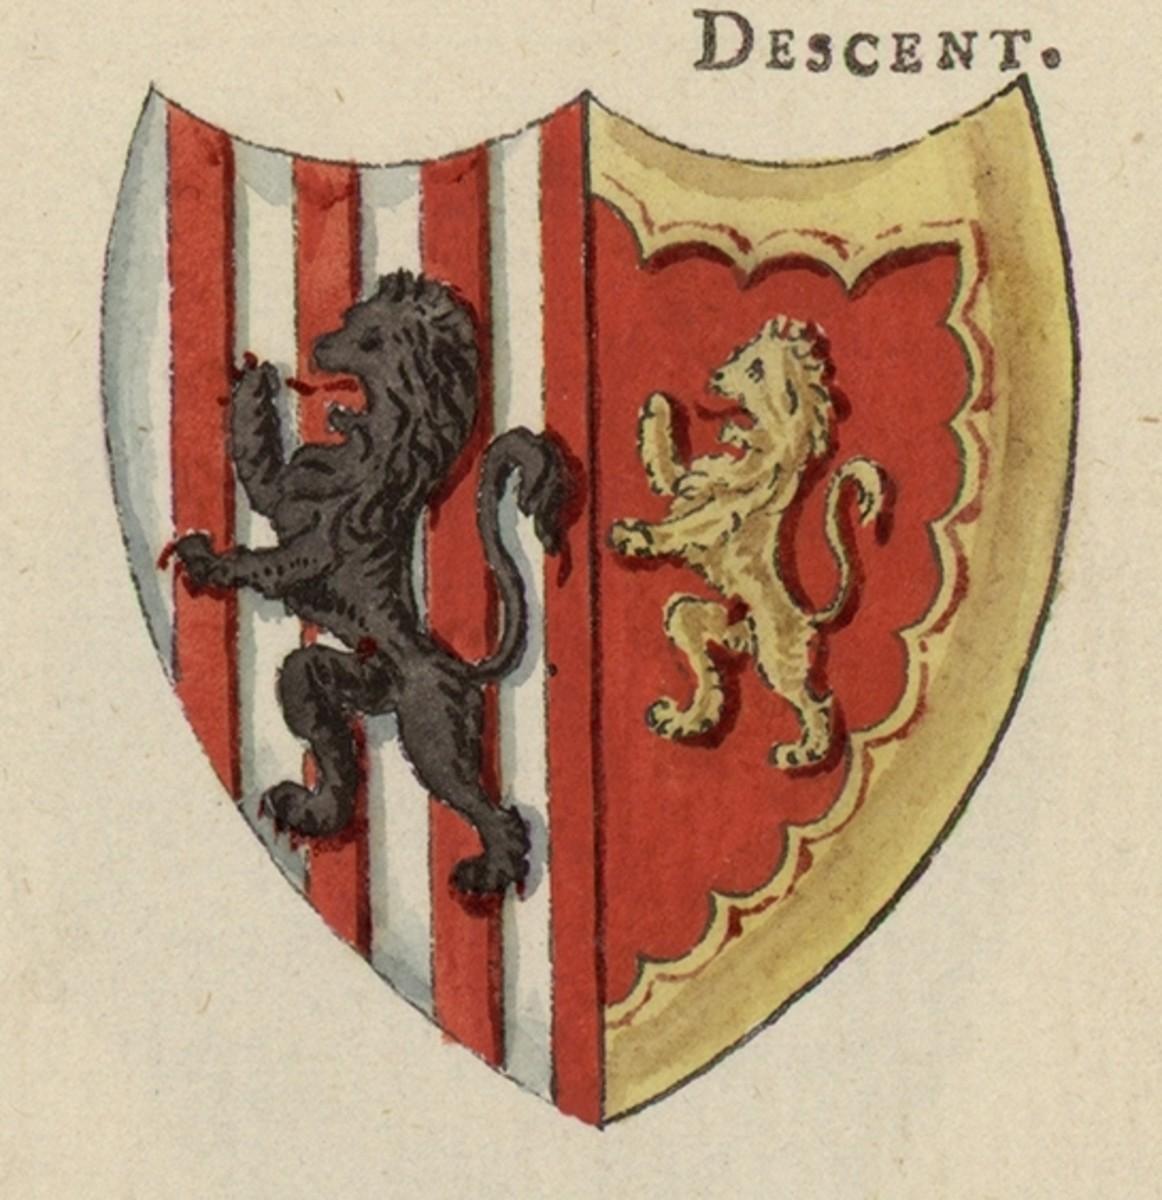 Owain Glyndŵr's coat of arms.